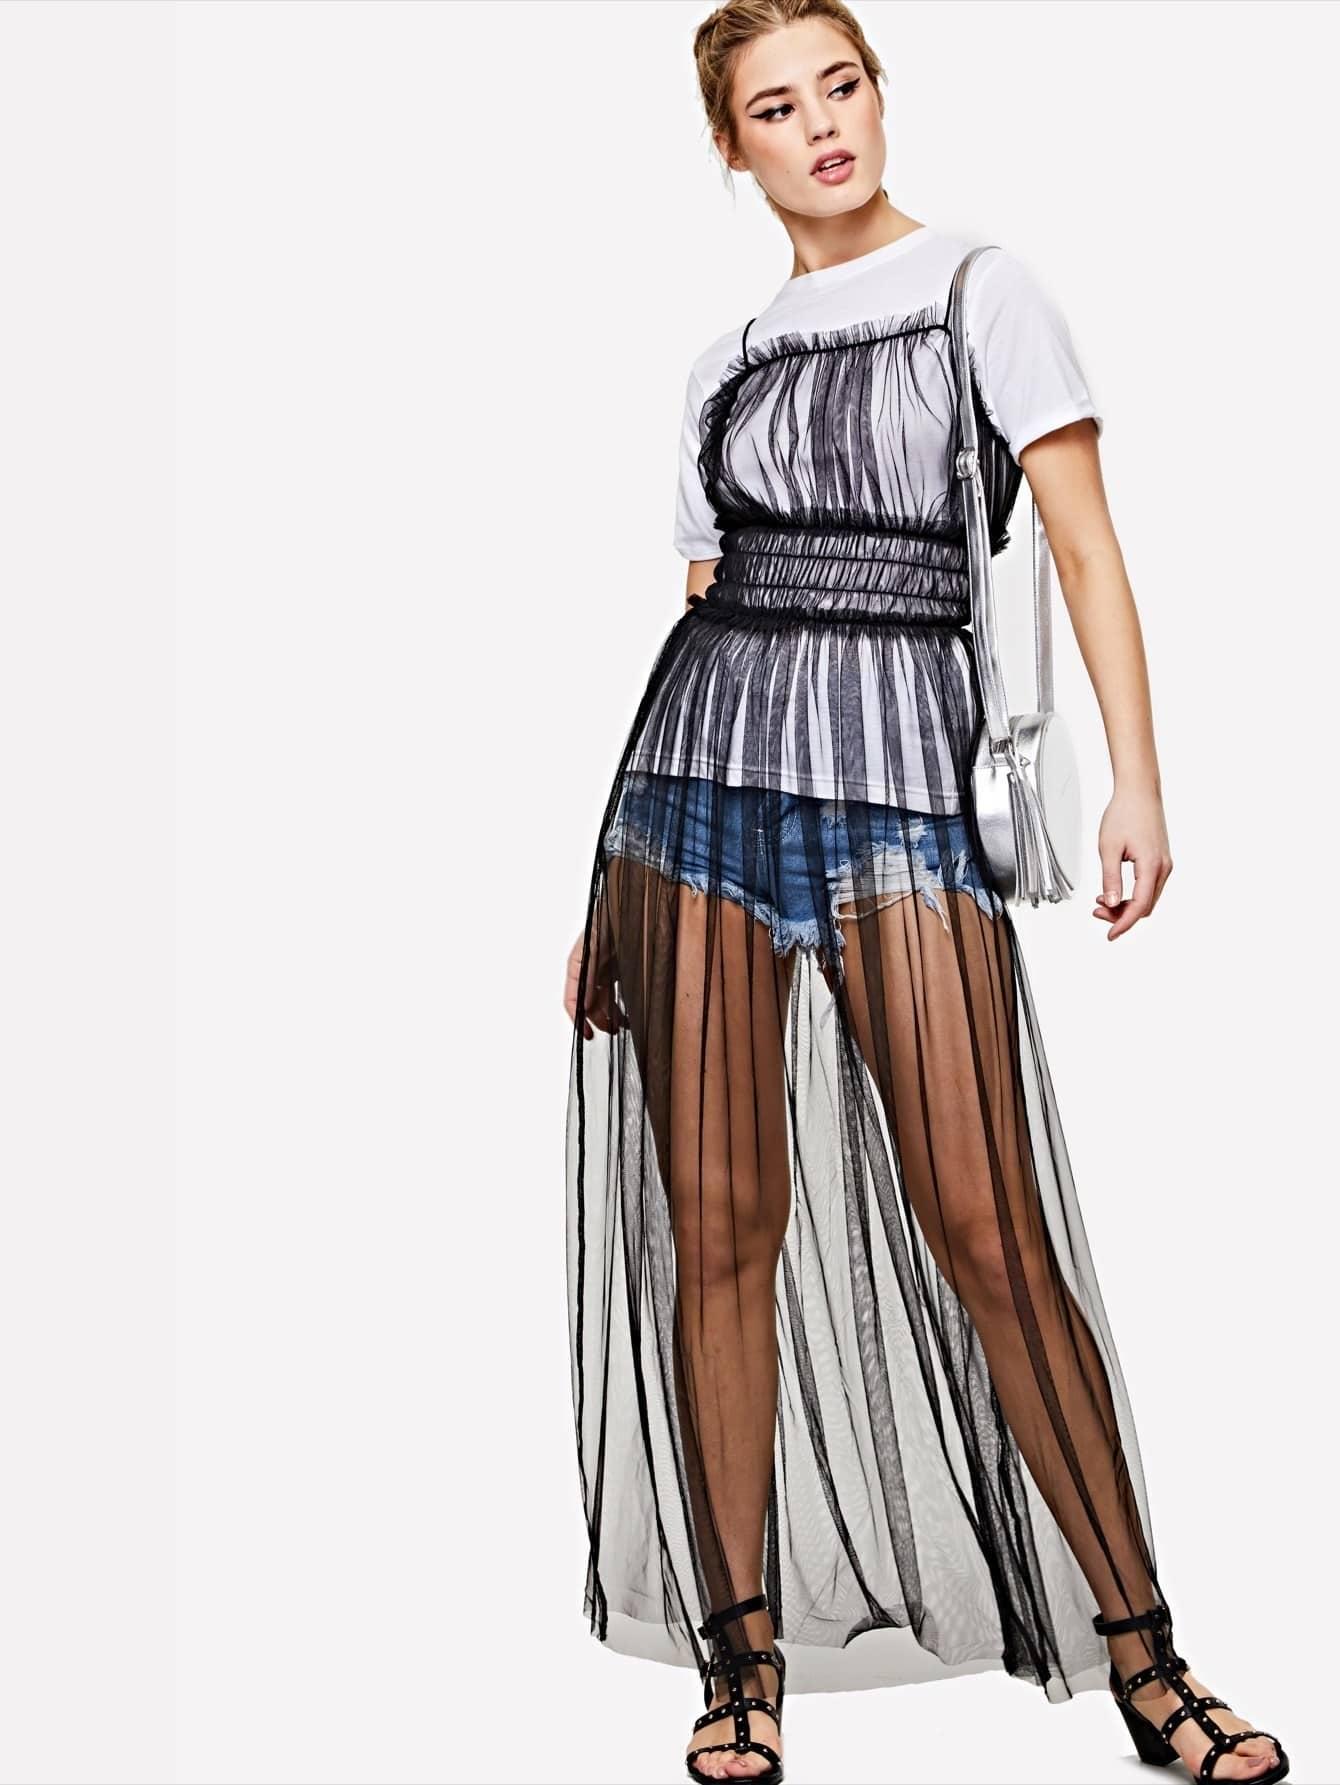 Frilled Shirred Waist Mesh Cover Up Dress shirred waist zip back fit